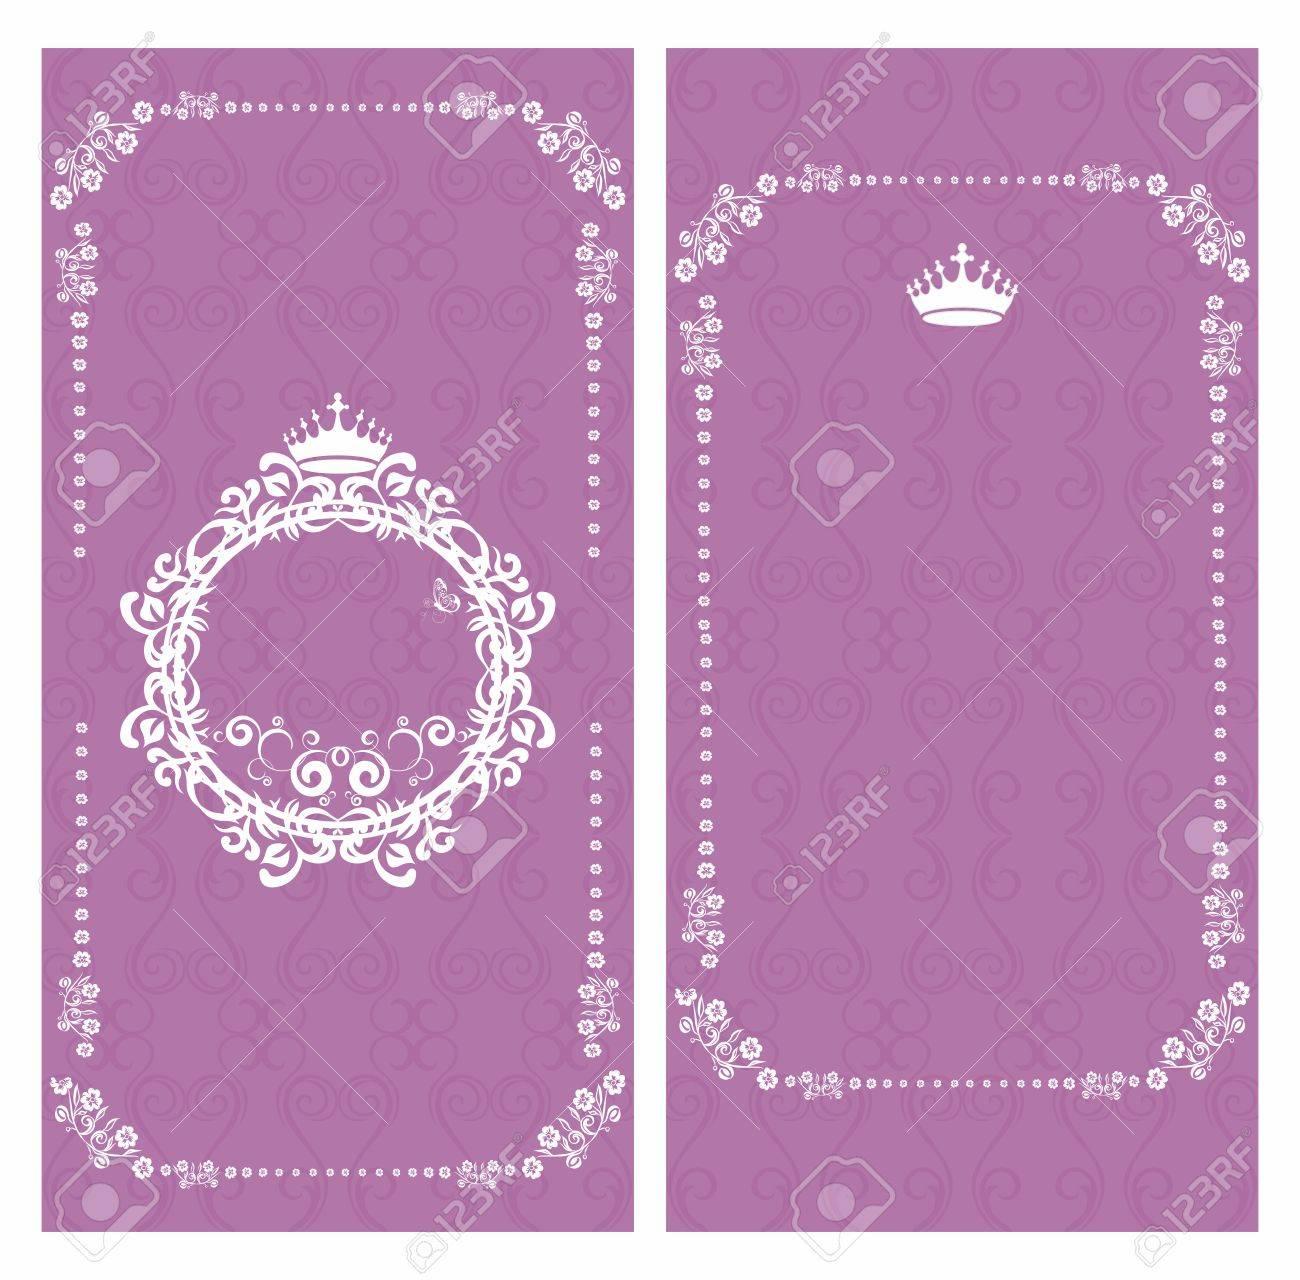 Vector Floral Violet Purple Banner Background Greeting Card Invitation Template Layout Design